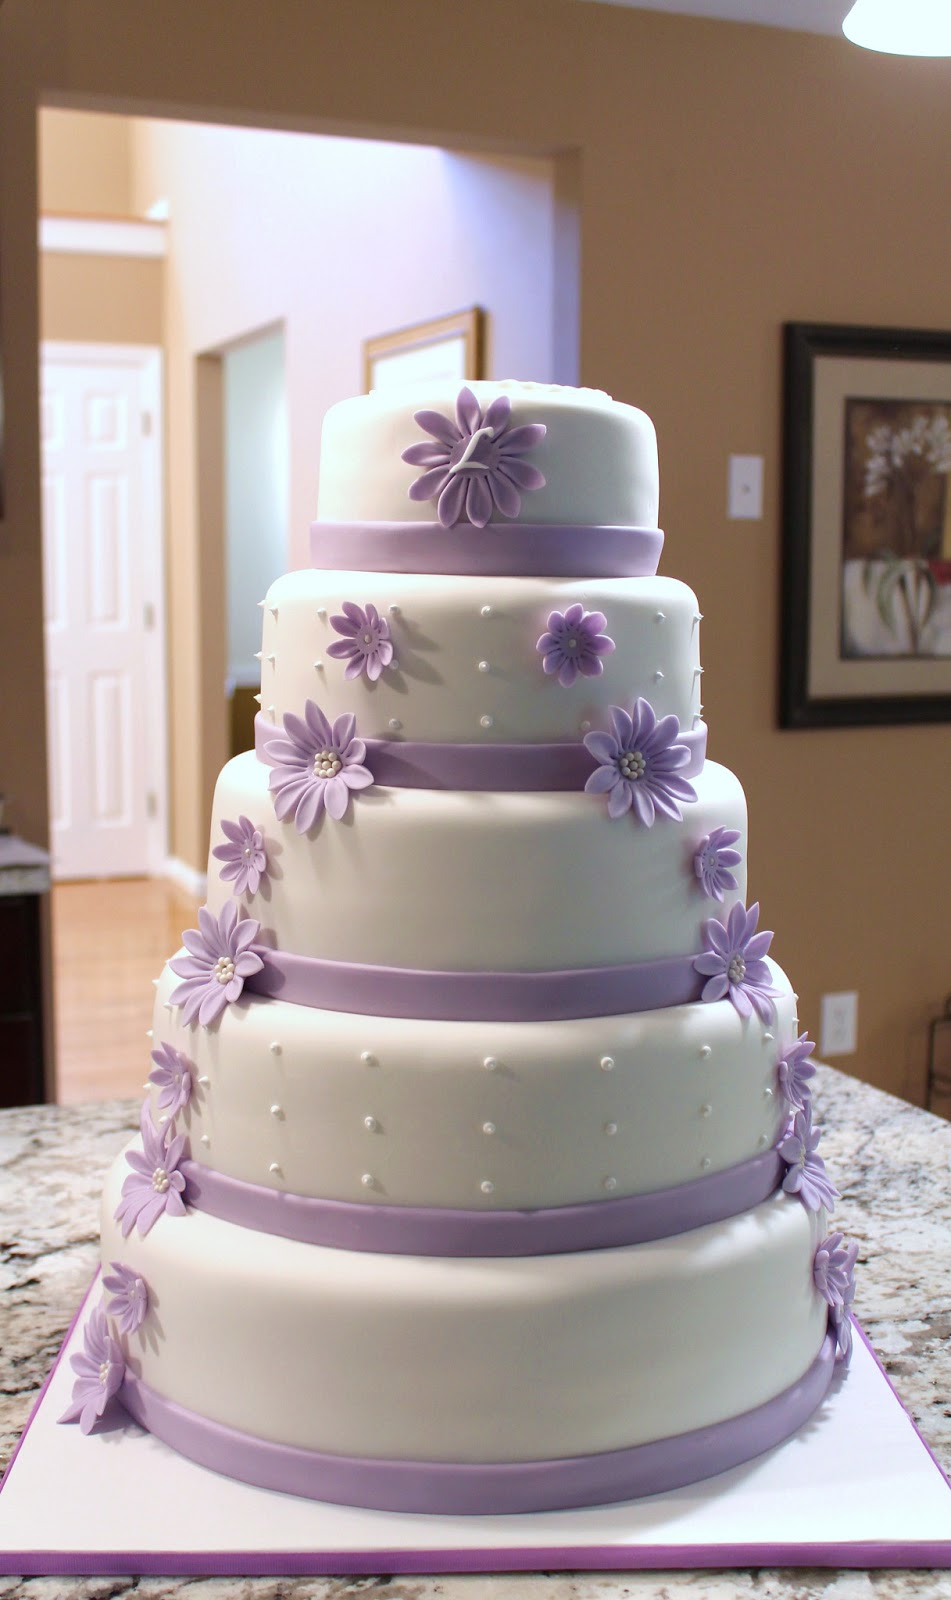 Creative Cakes by Lynn Lilac Flower Wedding Cake